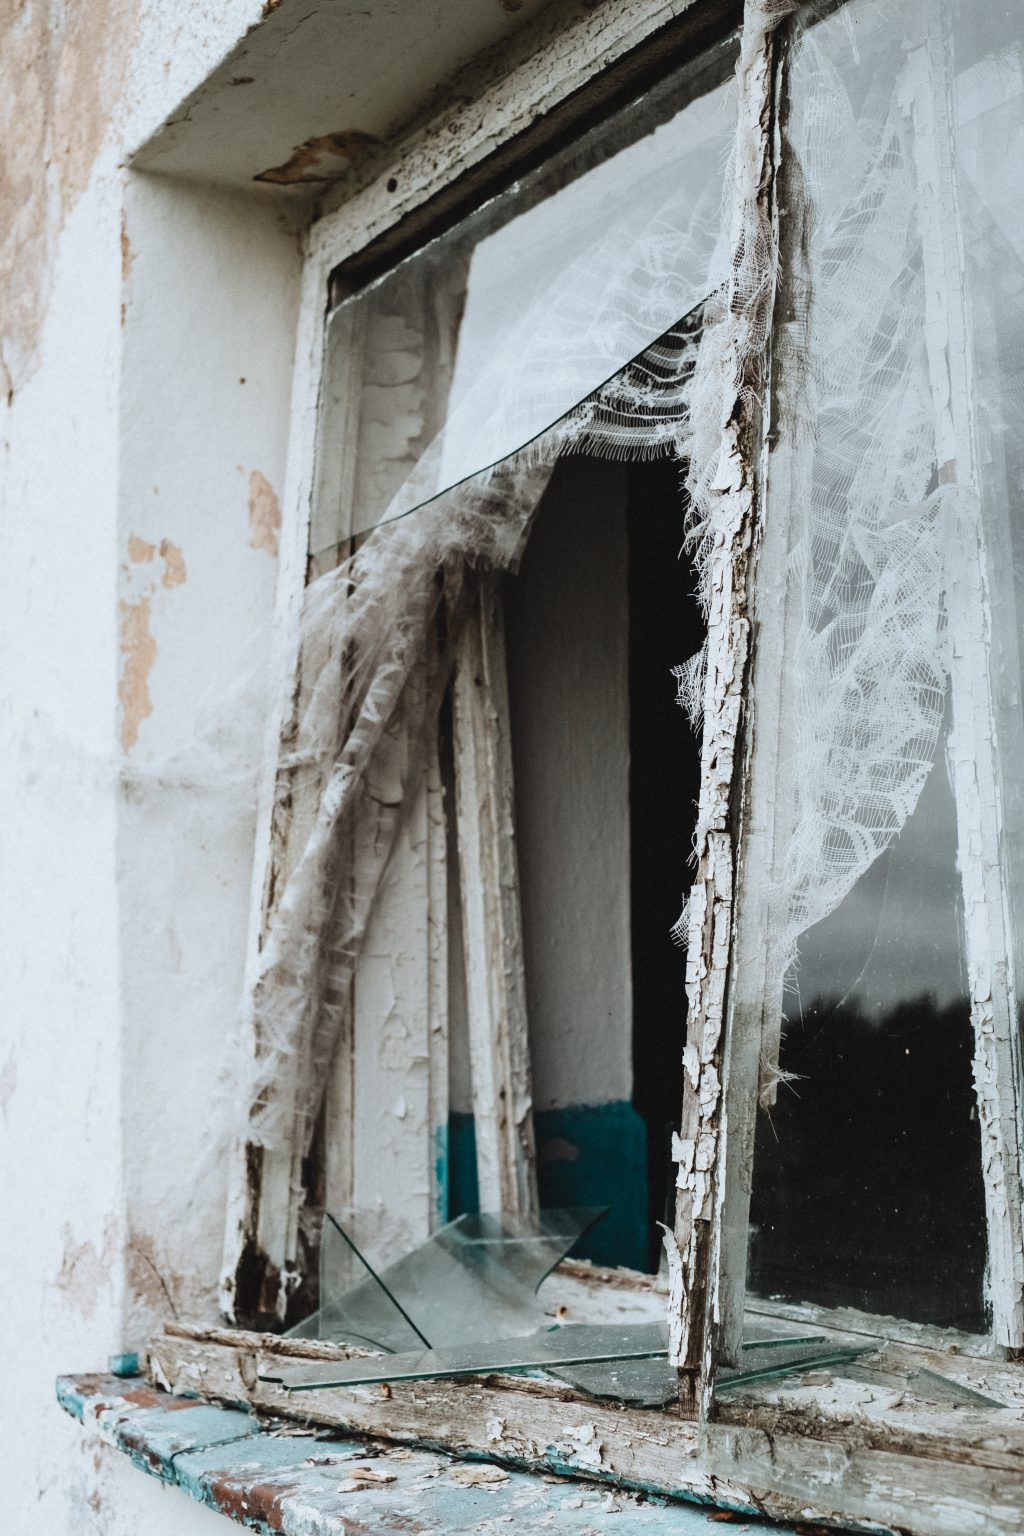 Abandoned ruined building window - free stock photo